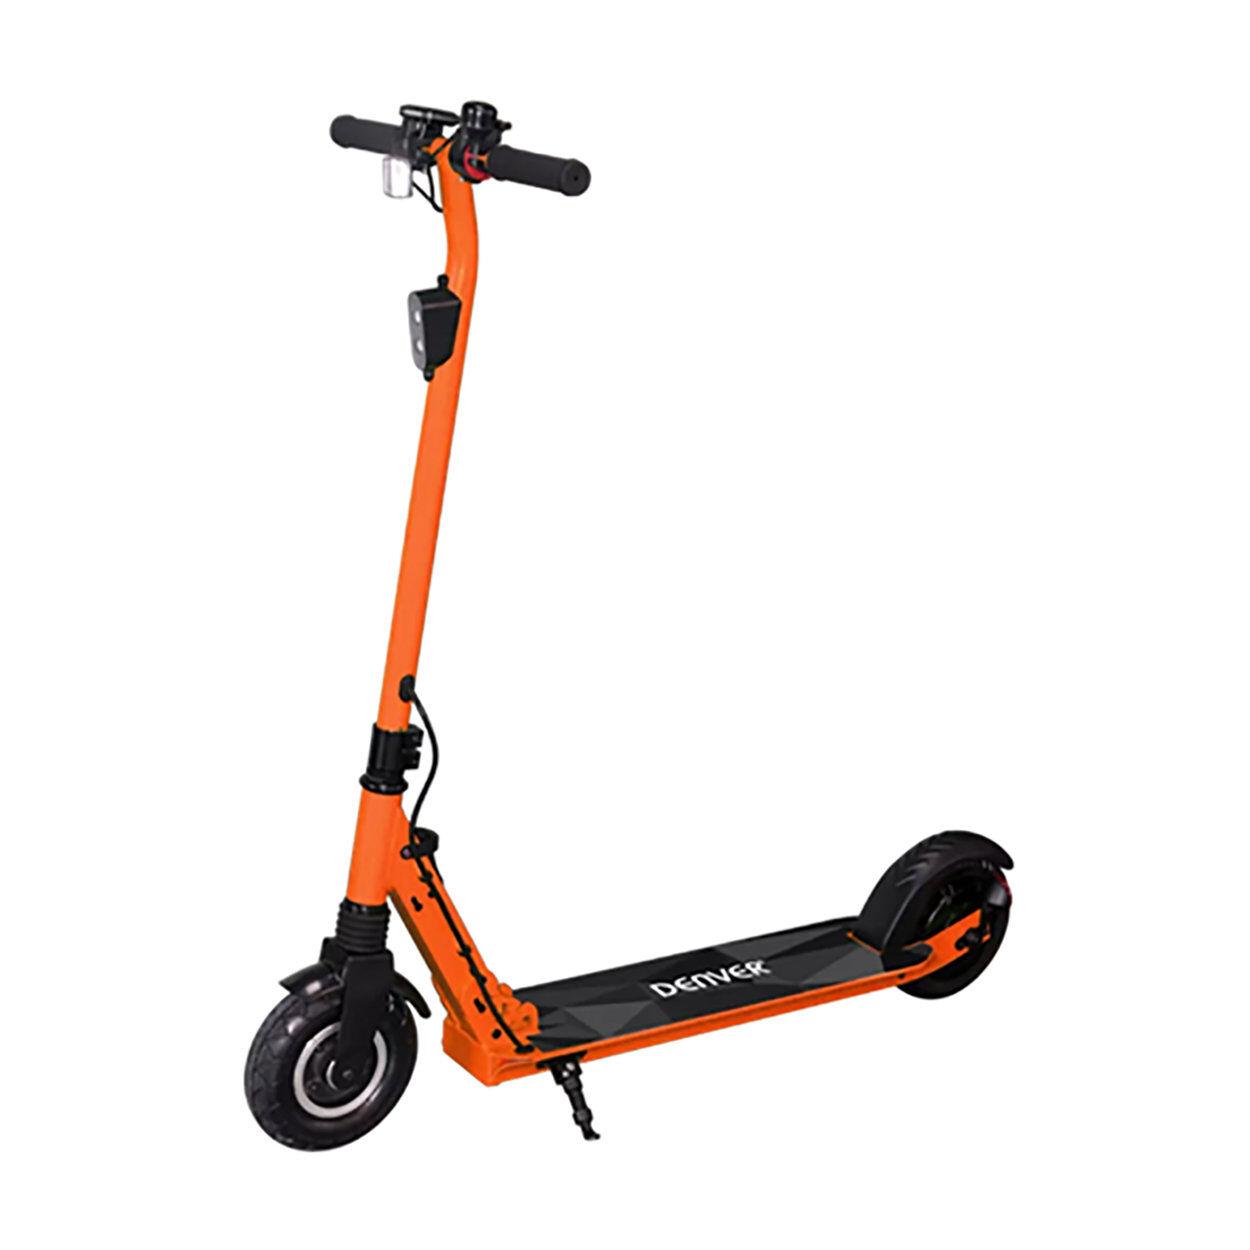 Urban Bike Denver Monopattino Elettrico 250W, arancione